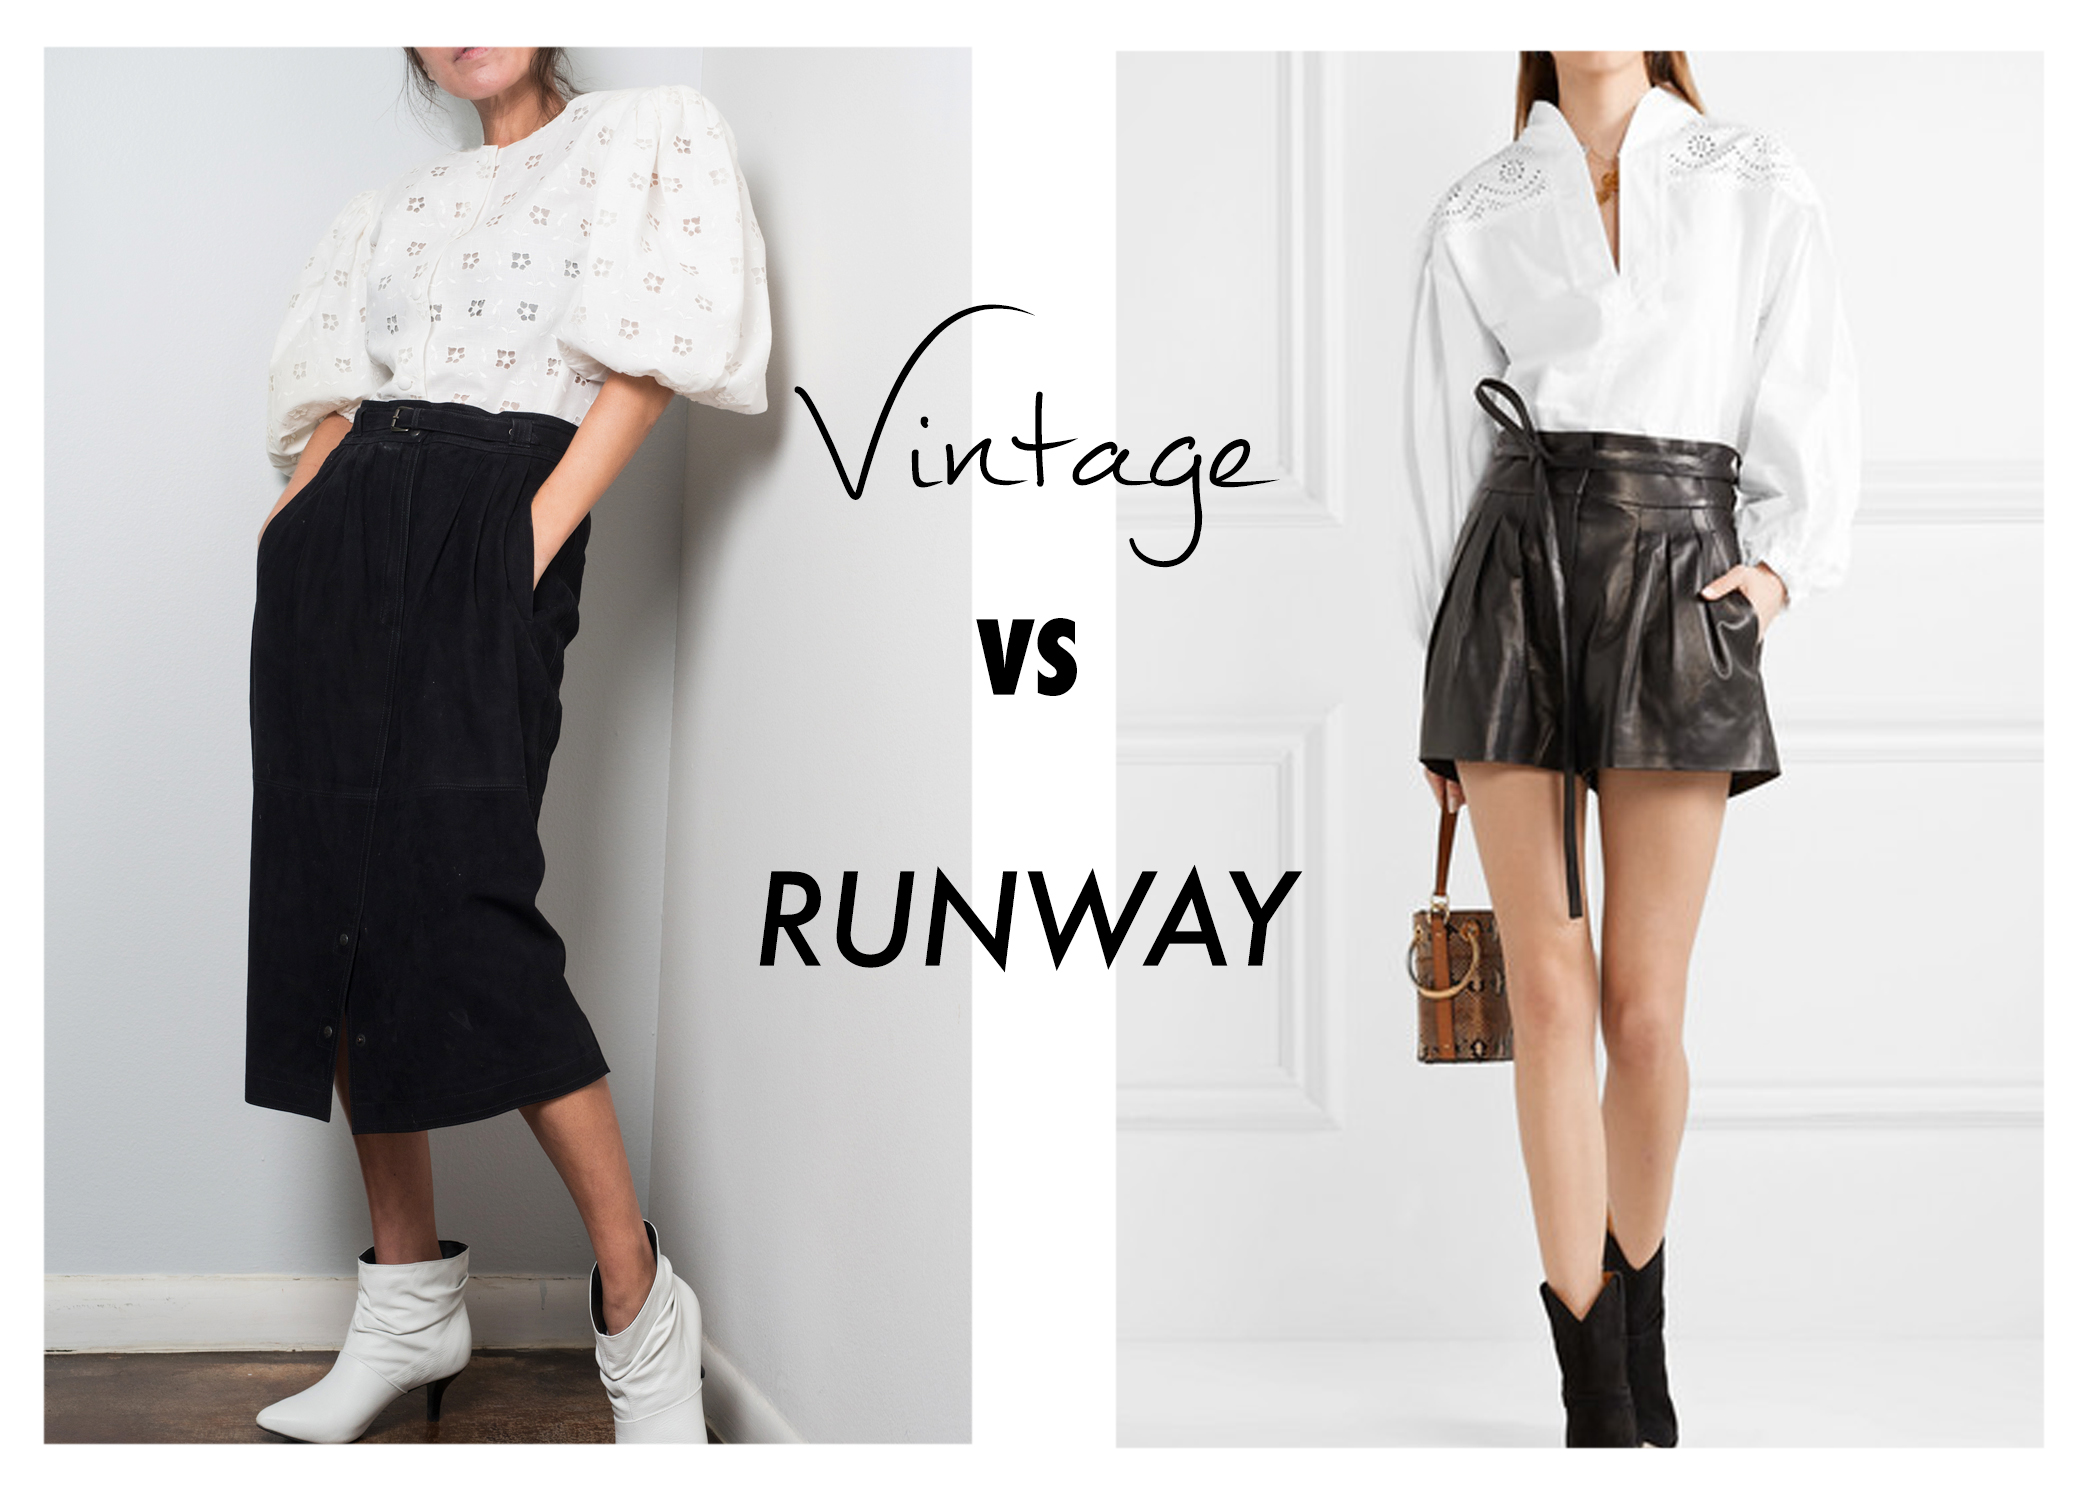 Vtg vs runway philosophy lorenzo serafini vs vintage laroche white eyelet top.jpg